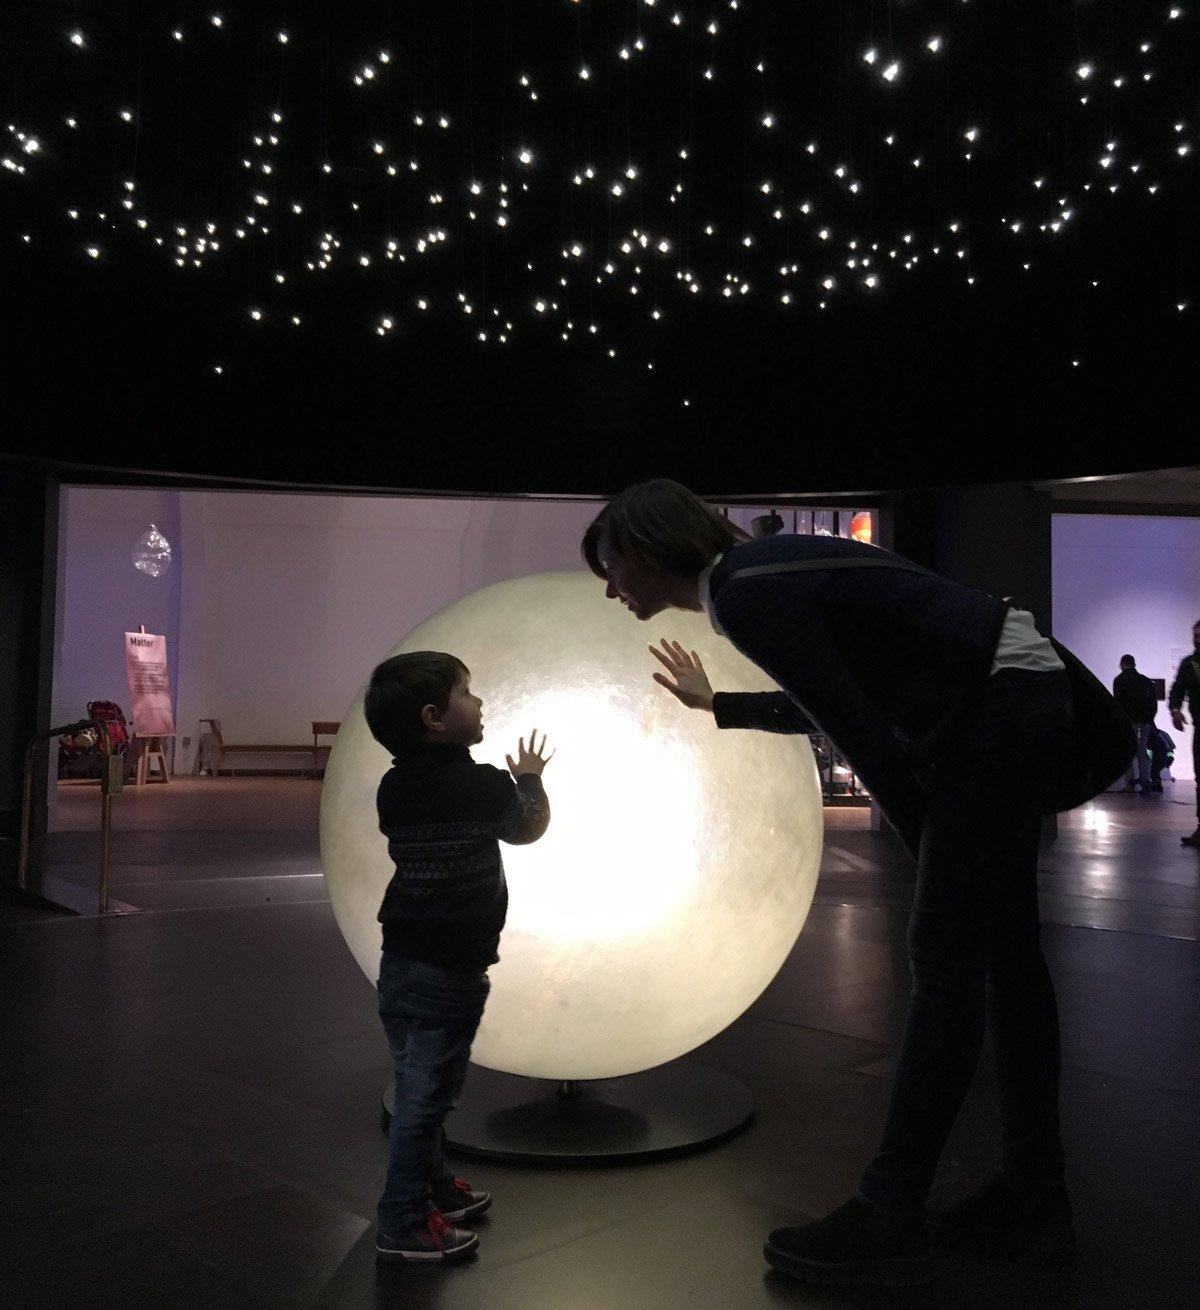 Cosa vedere al WonderLab al Science Museum